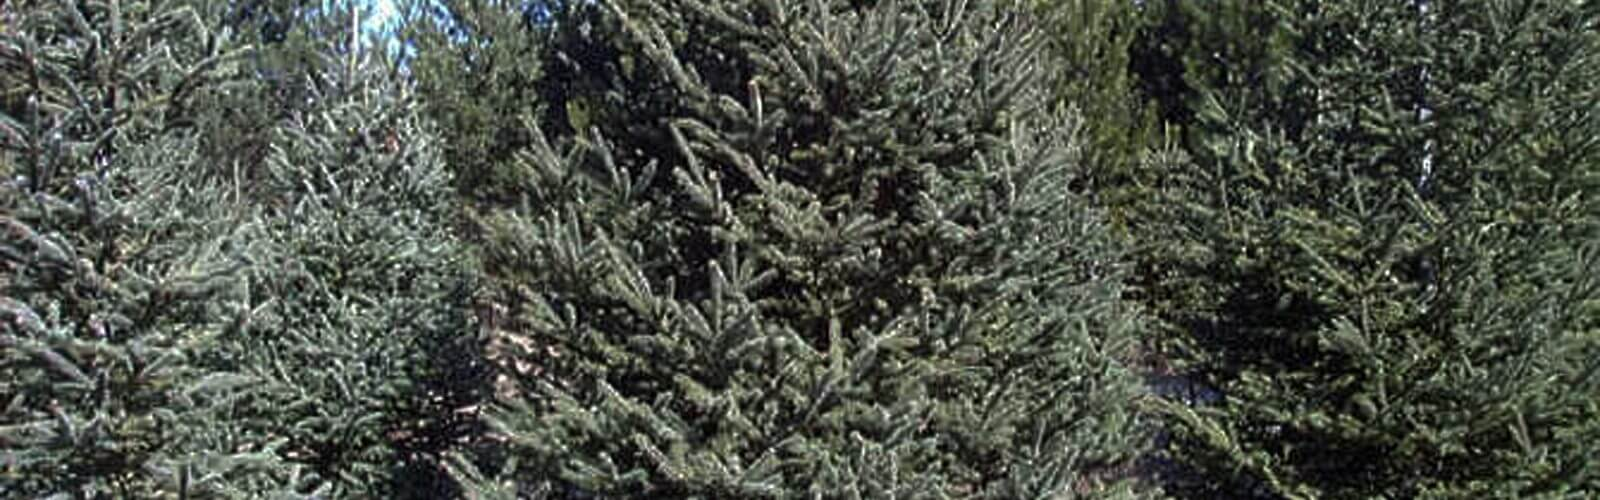 Species Spotlight – White Spruce